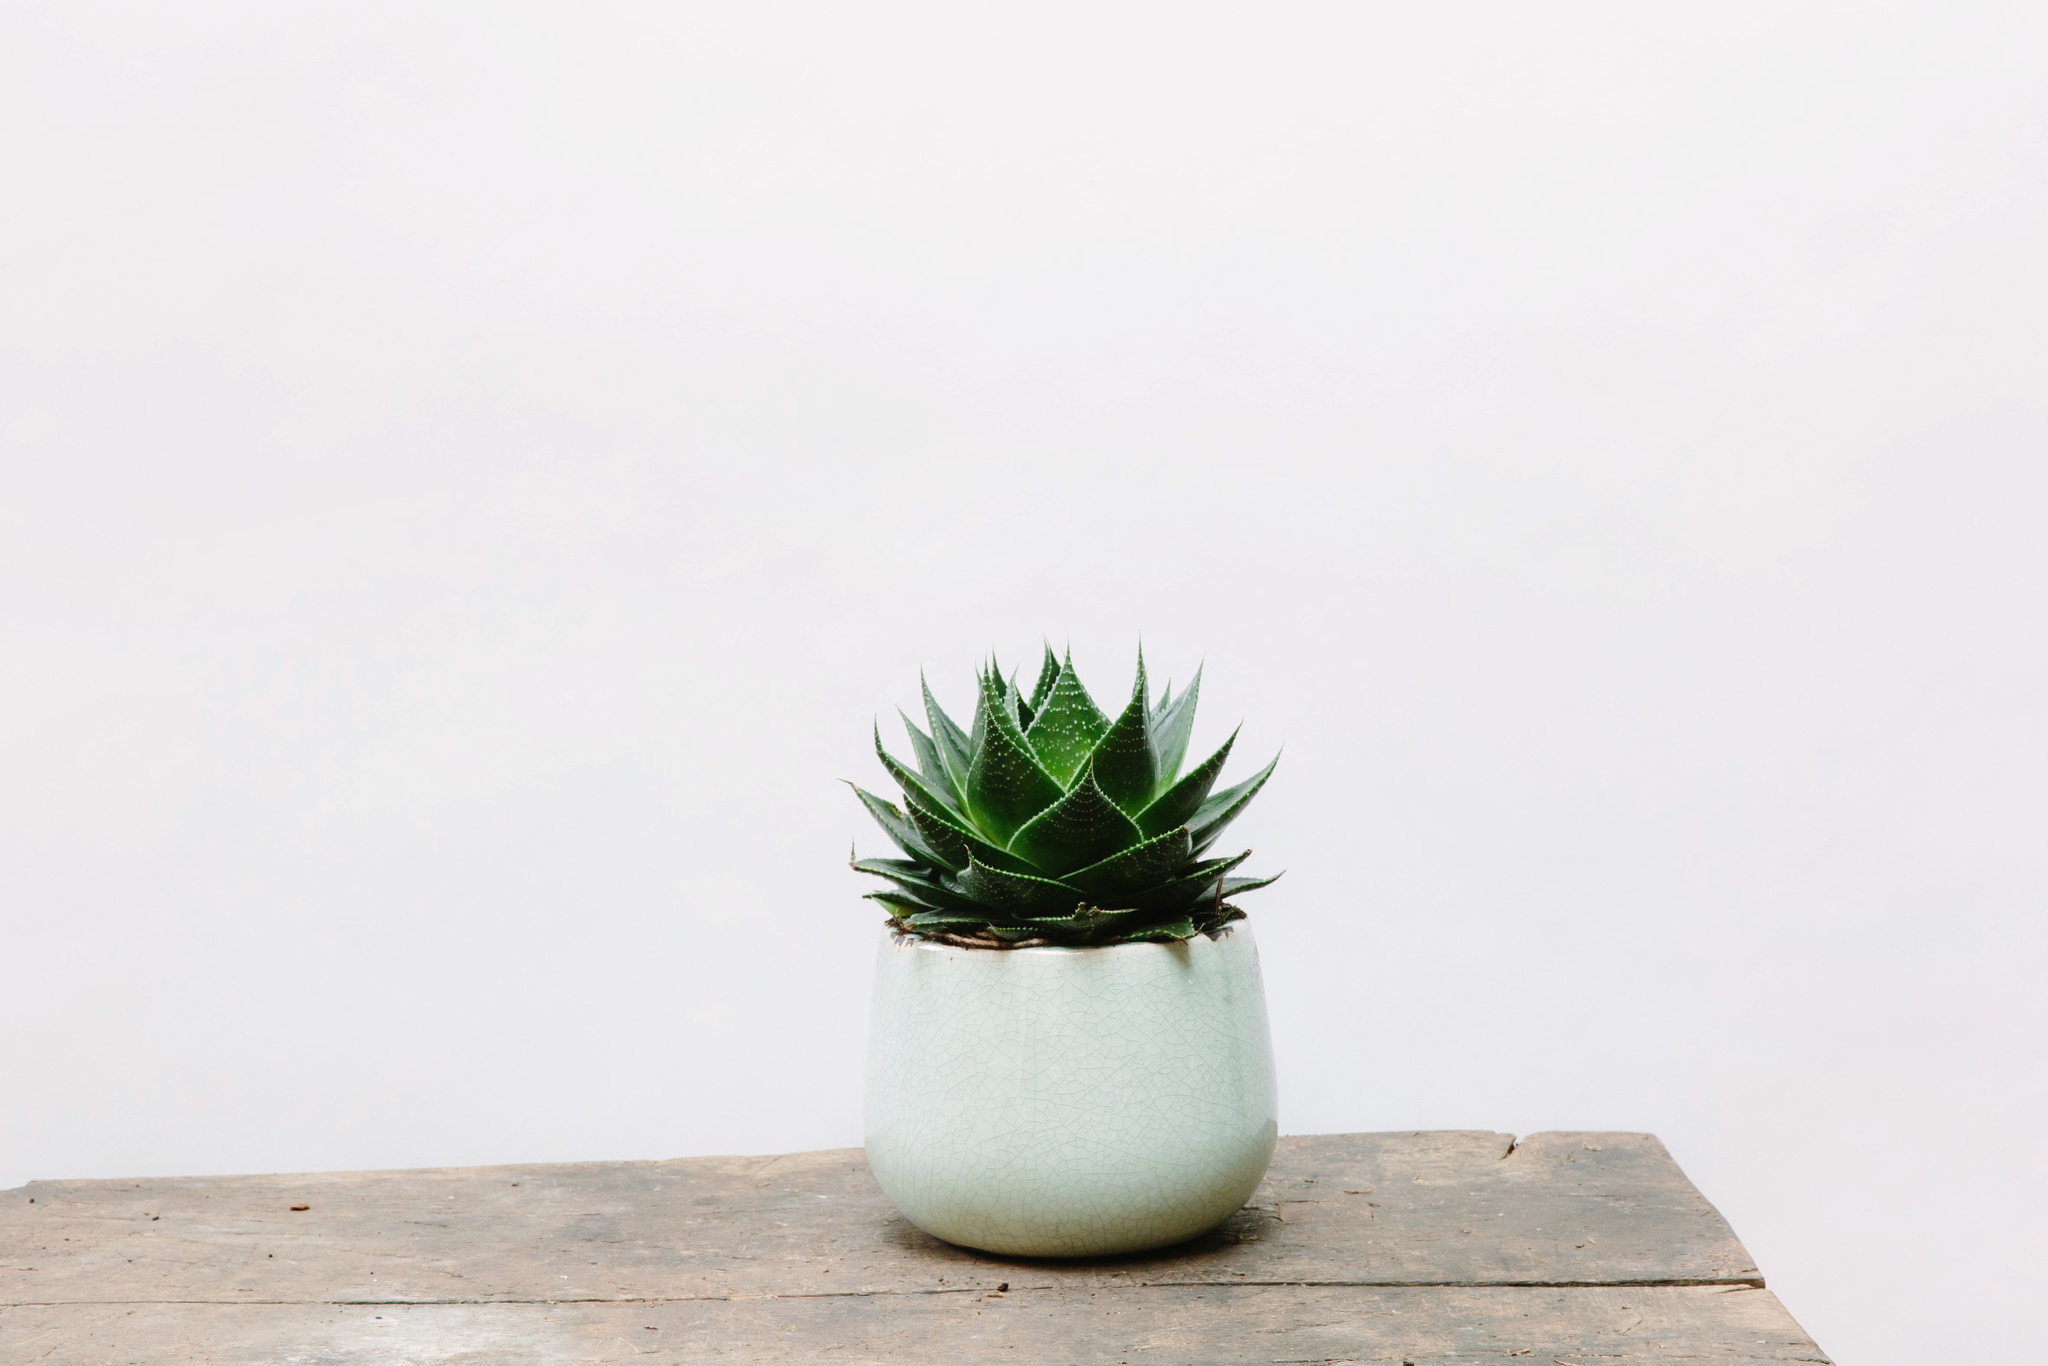 Teal crackle ceramic pot  - Trouva - £22 (H 18cm x W 21cm)